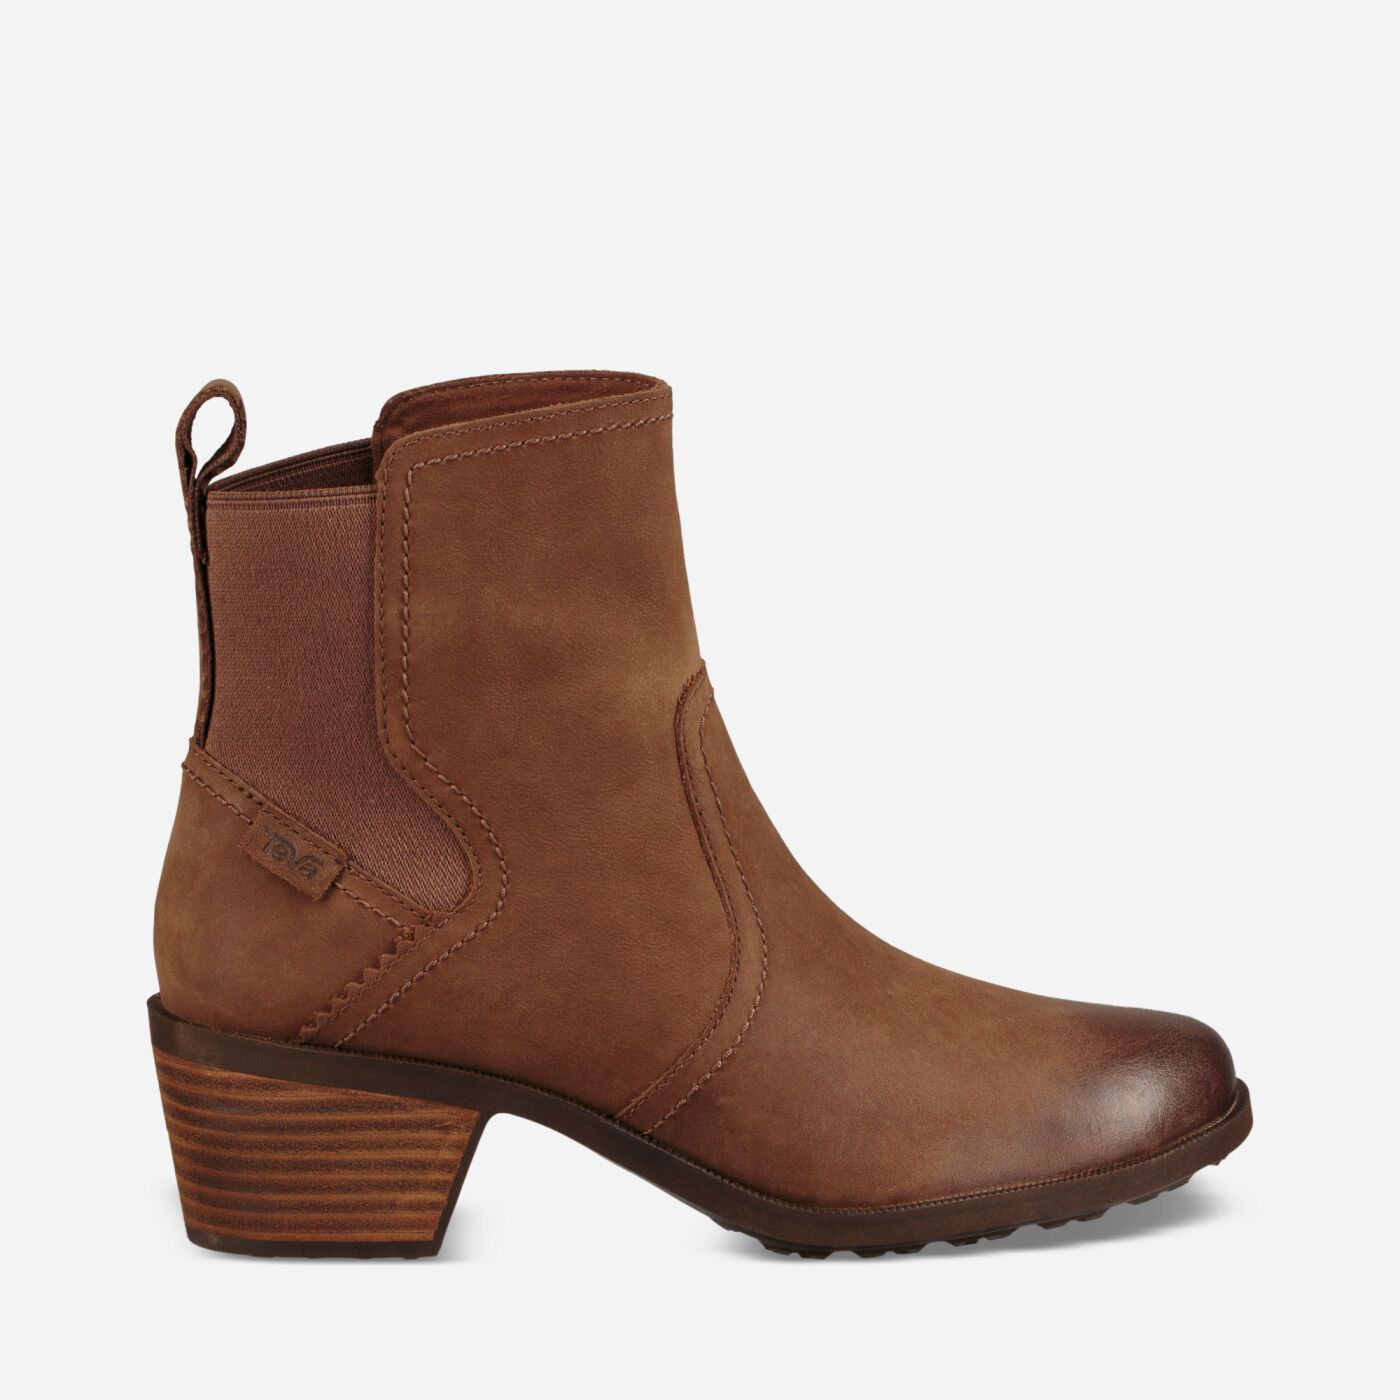 waterproof dress boots womens